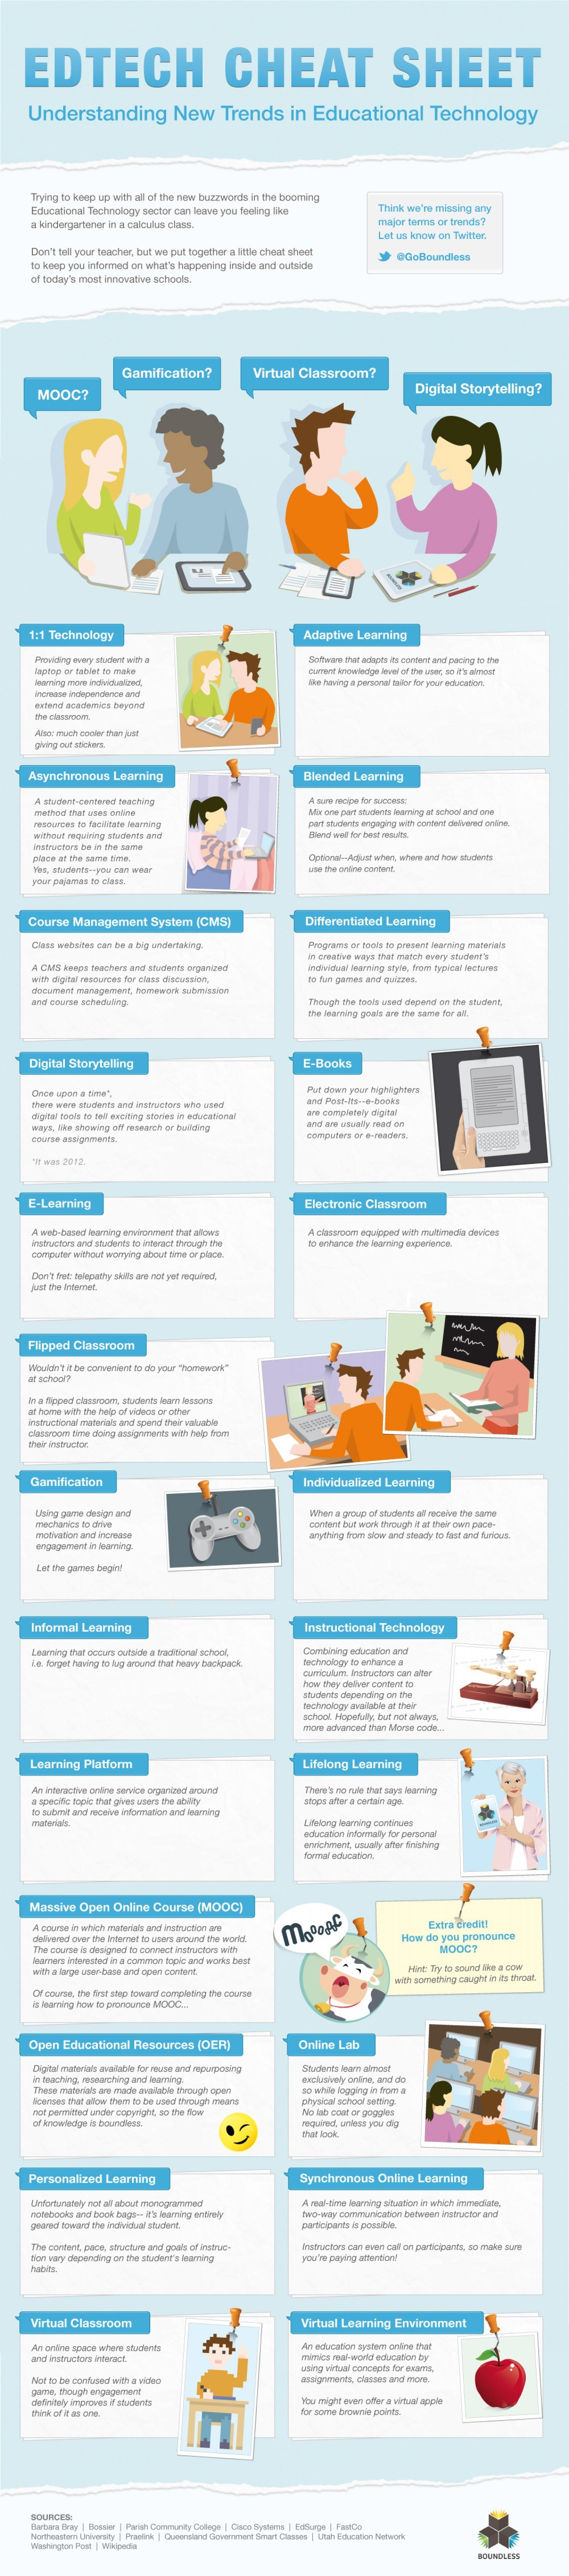 The EdTech Cheat Sheet for Teachers Infographic